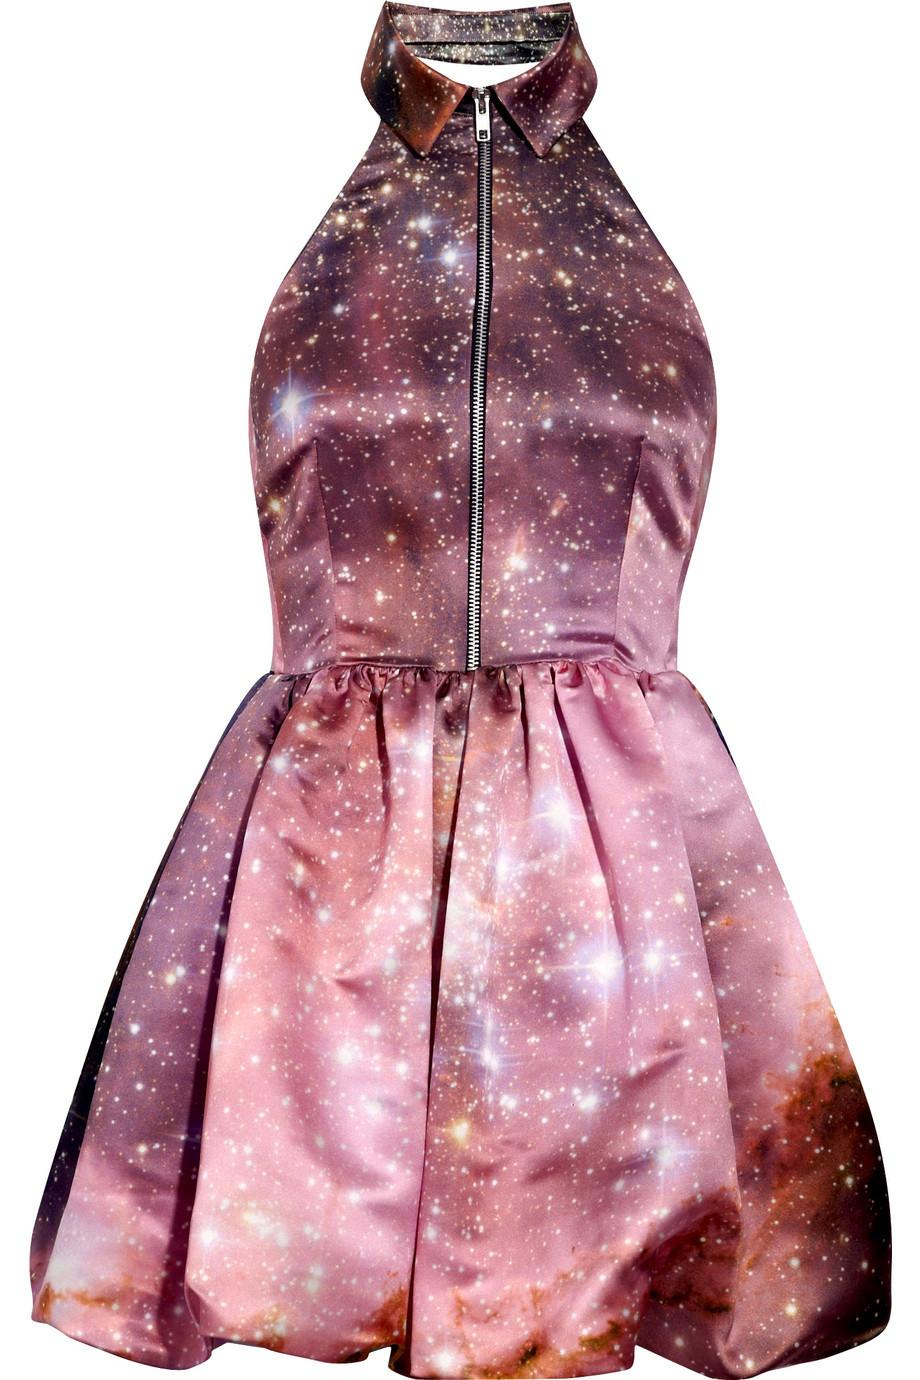 Christopher Kane Galaxy Dress Christopher Kane Click to